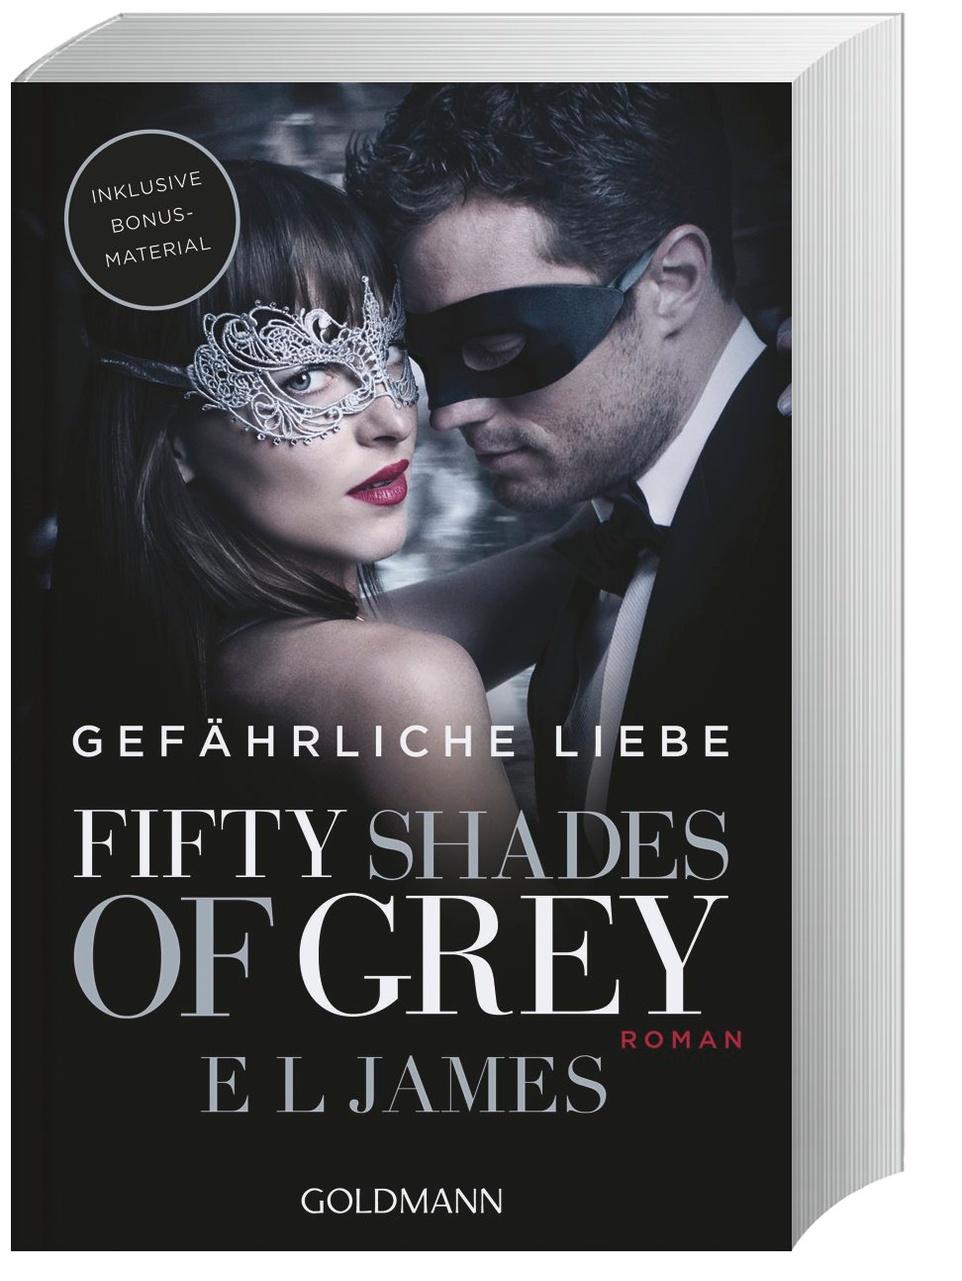 Fifty Shades of Grey - Gefährliche Liebe Shades of Grey